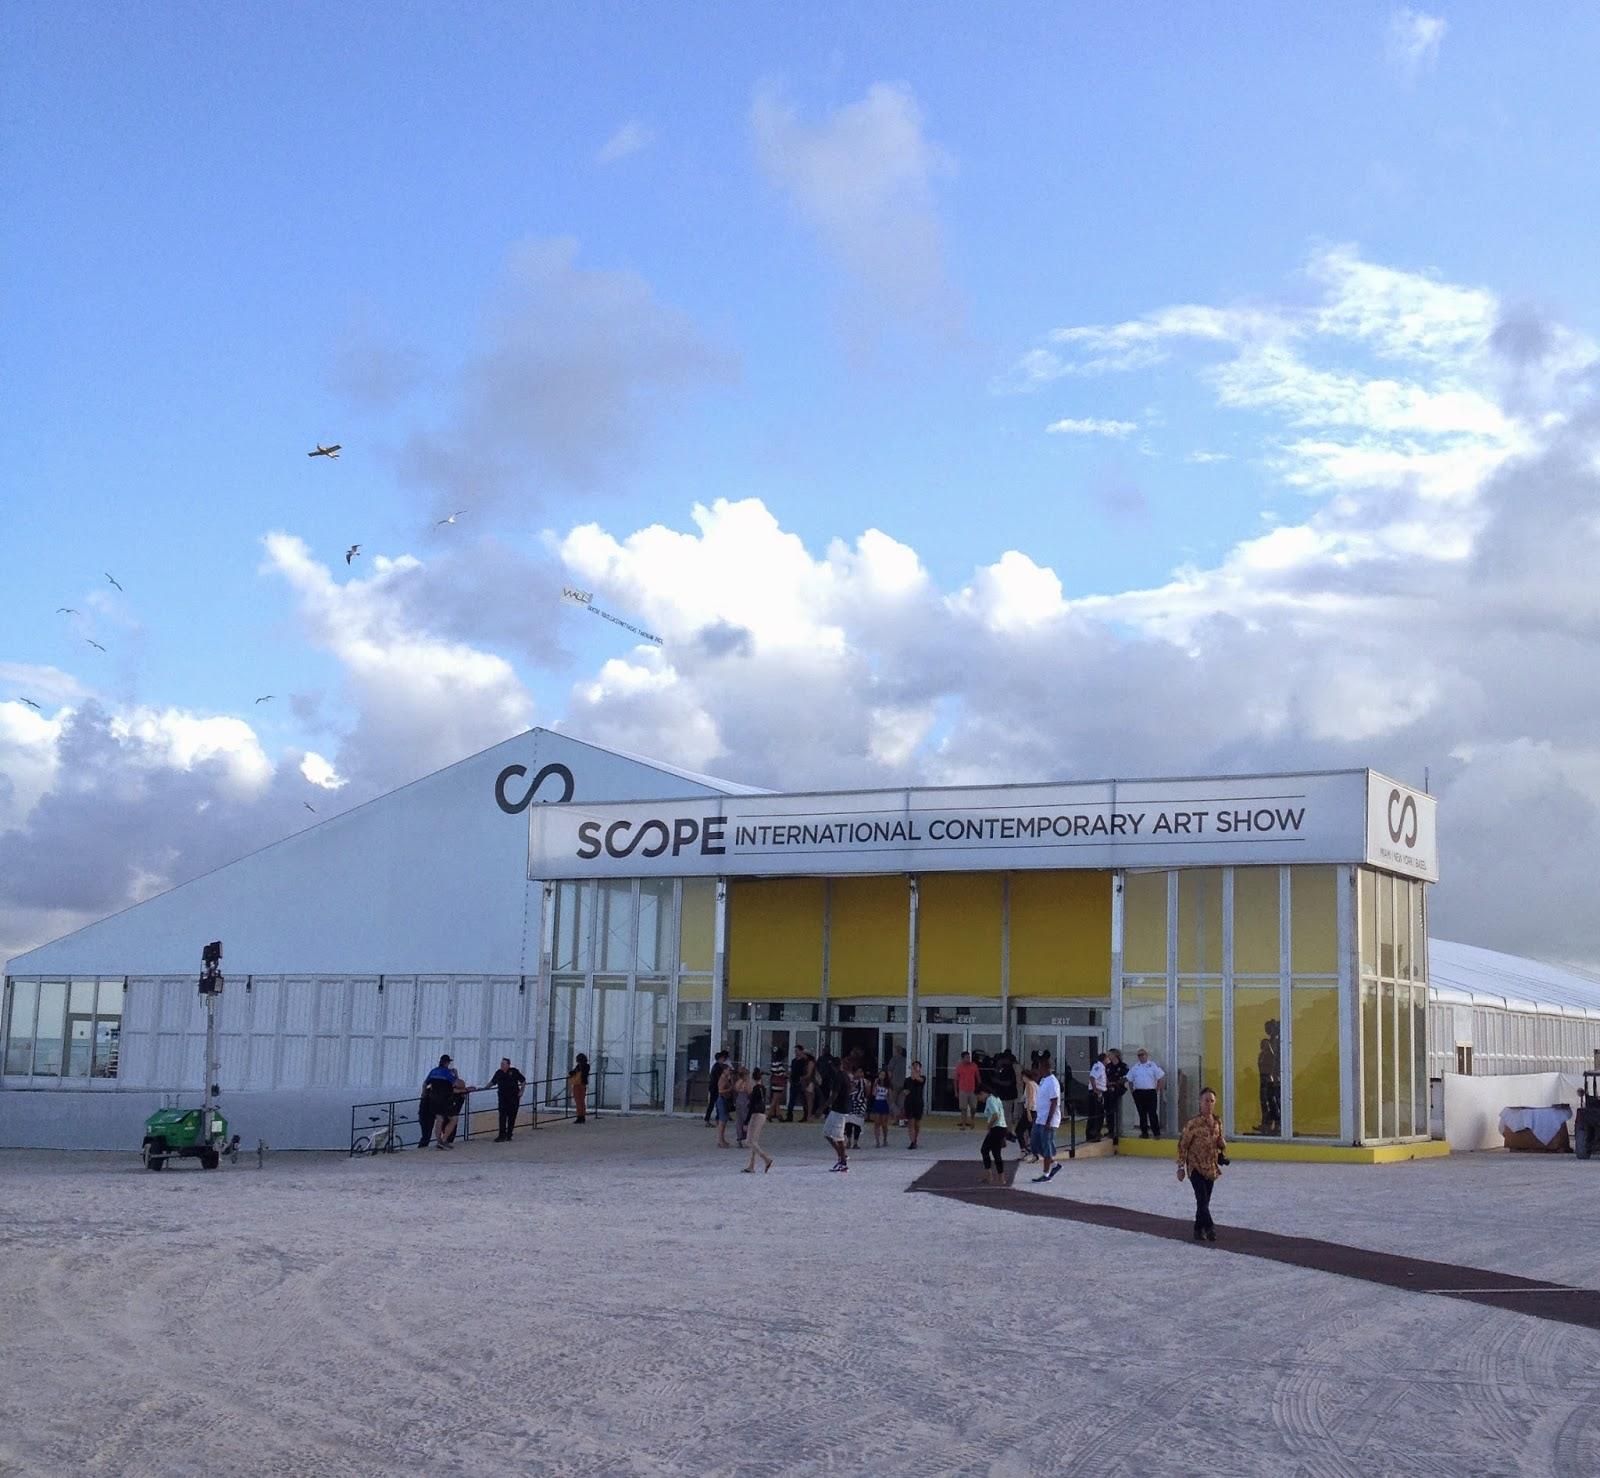 Scope Art Fair is quite literally on the beach.